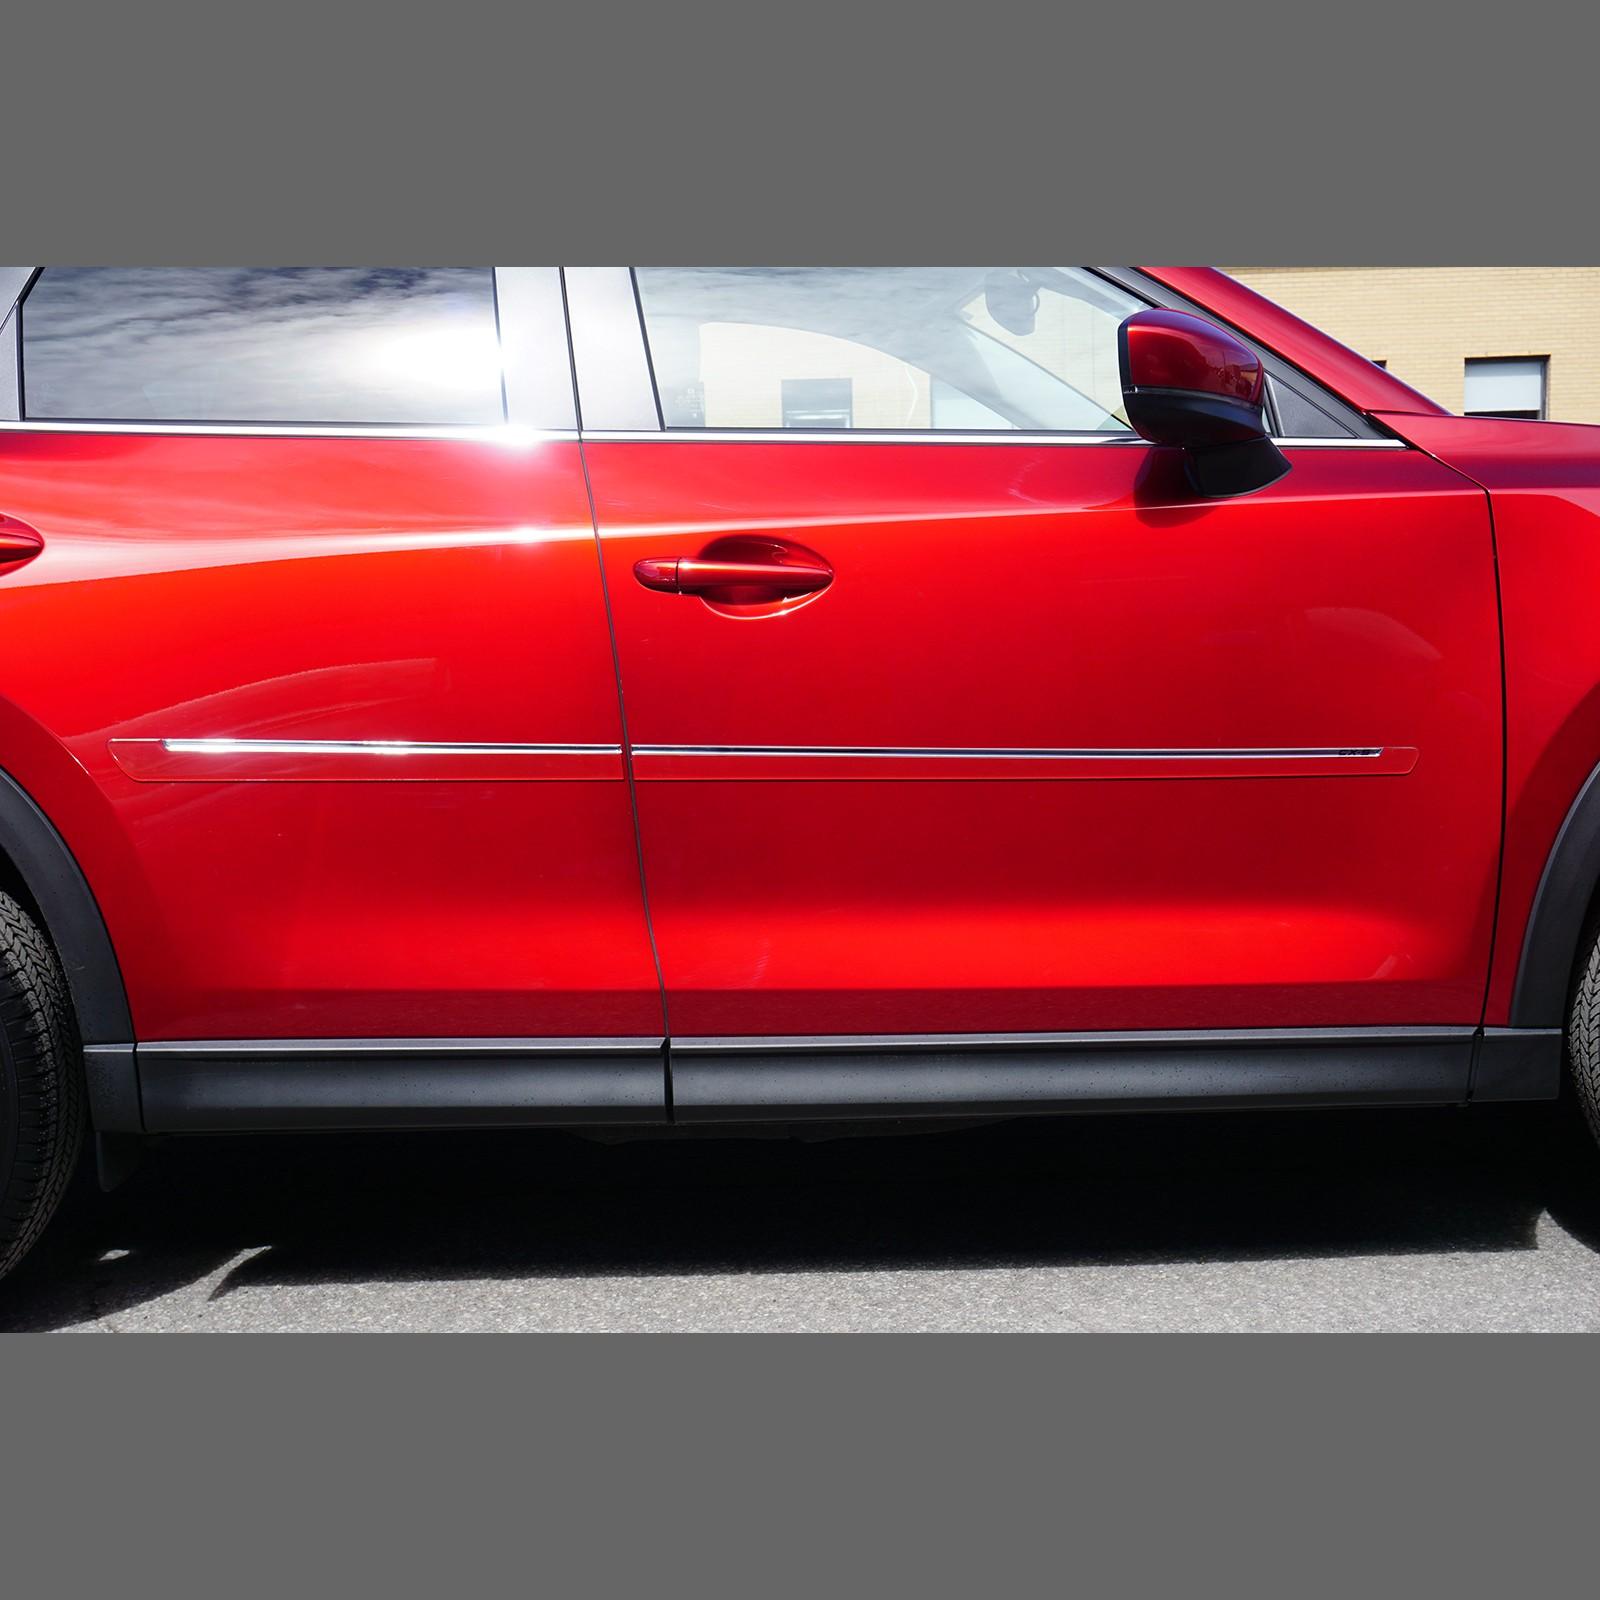 Mazda Cx5 Reviews: Body Side Moldings For 2017 Mazda CX-5 (SUV)